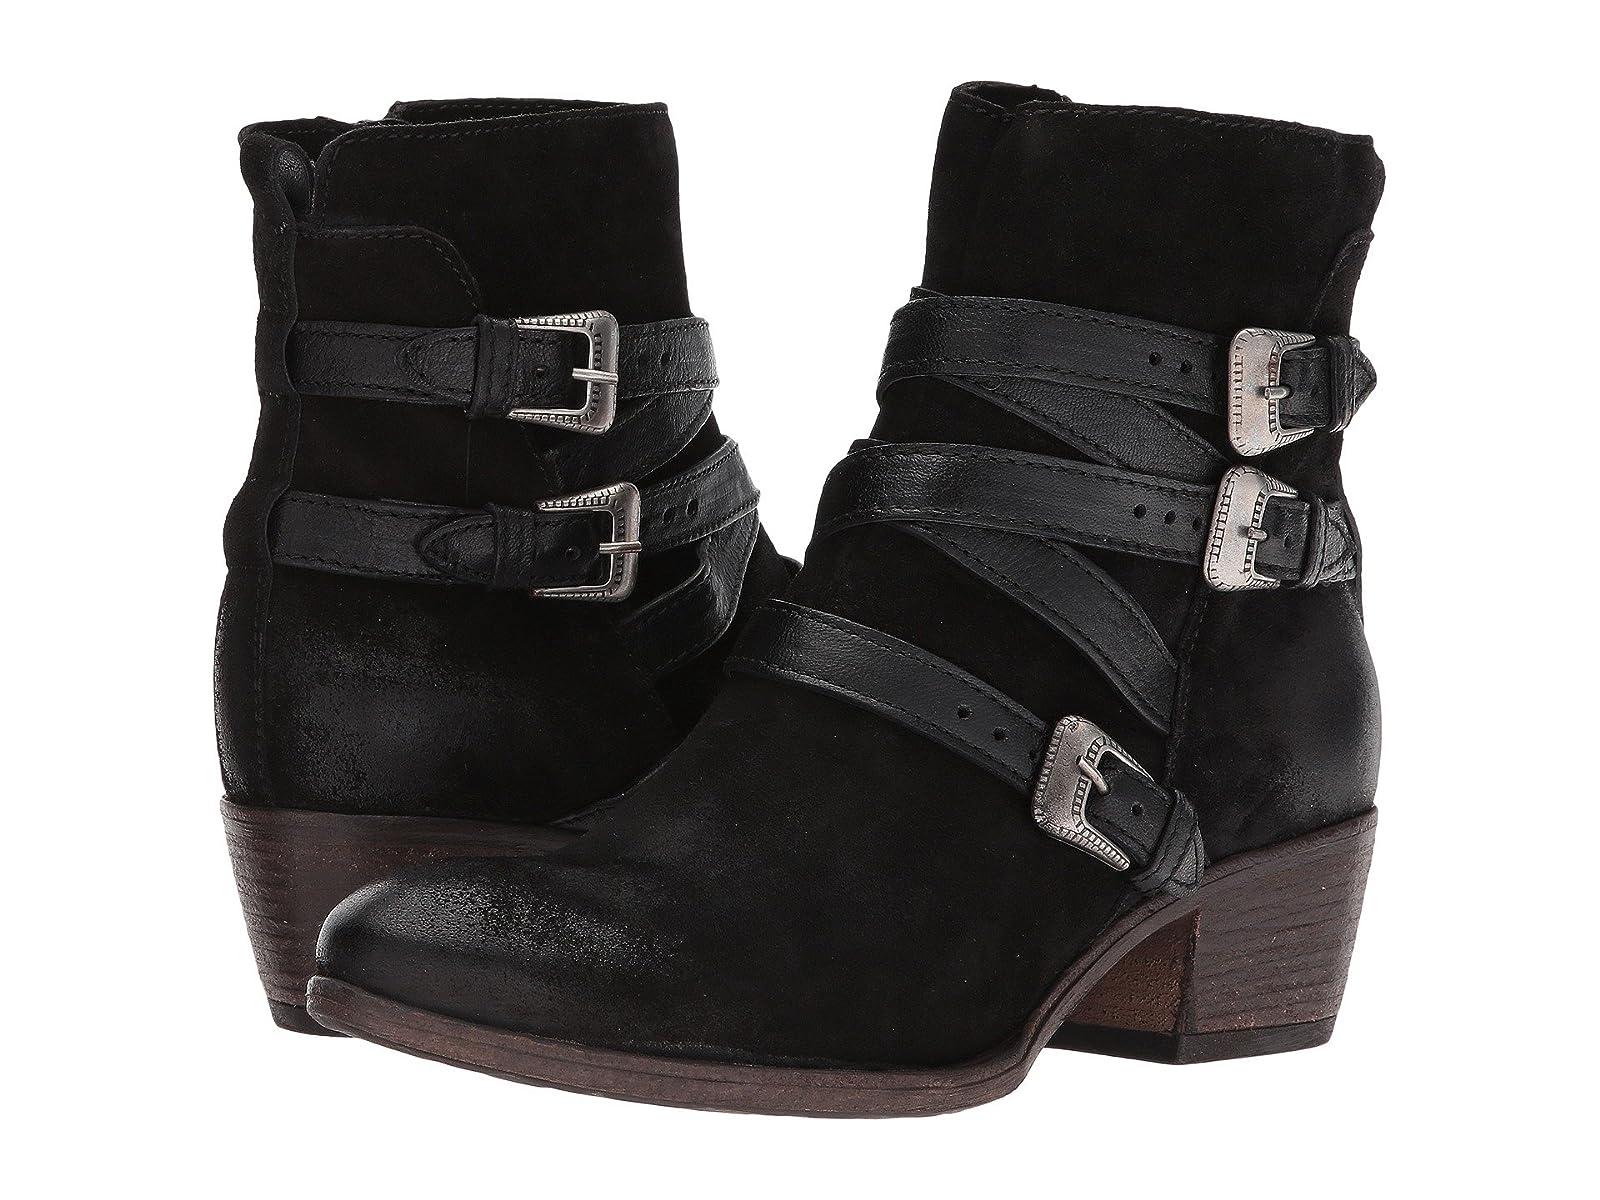 Miz Mooz DarienCheap and distinctive eye-catching shoes